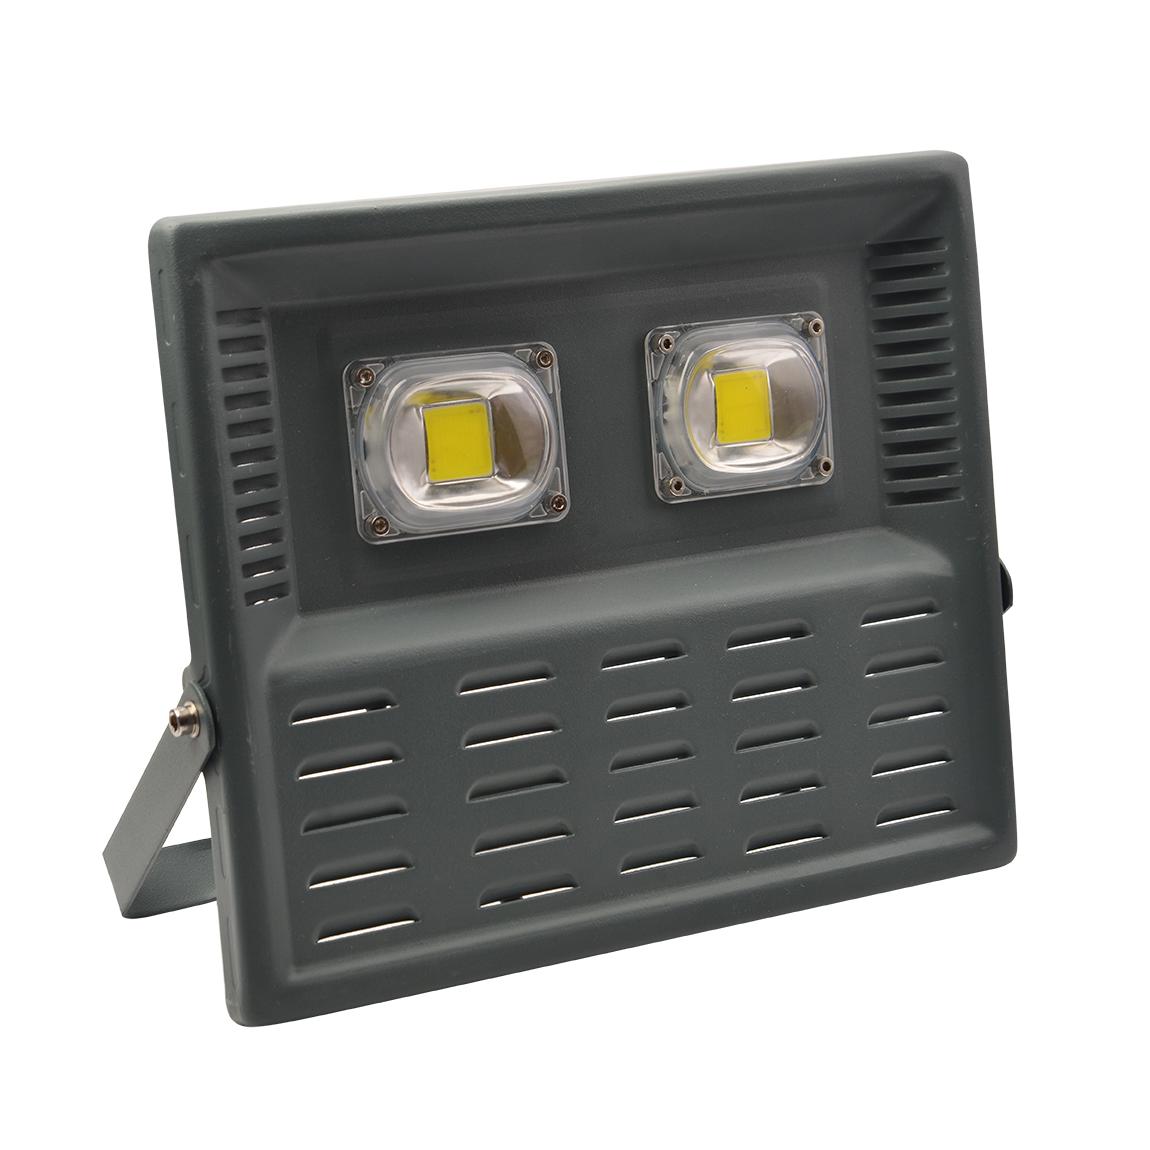 GENESIS FL-6042 - 100 Watt GENESIS Ultra Slim COB LED Projektör